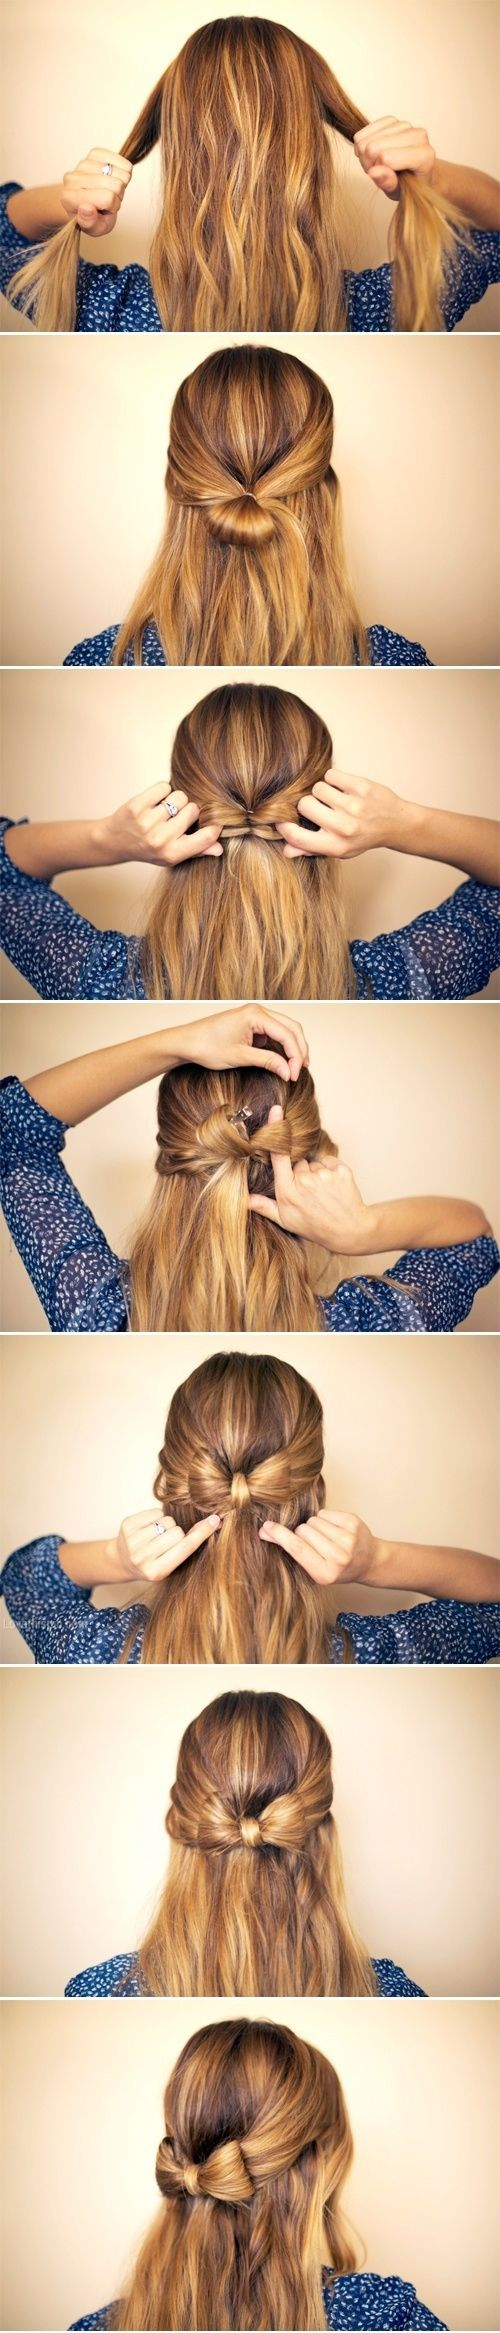 DIY Hair Bow diy diy crafts do it yourself diy art diy tips diy ideas diy hair bow diy hair easy diy